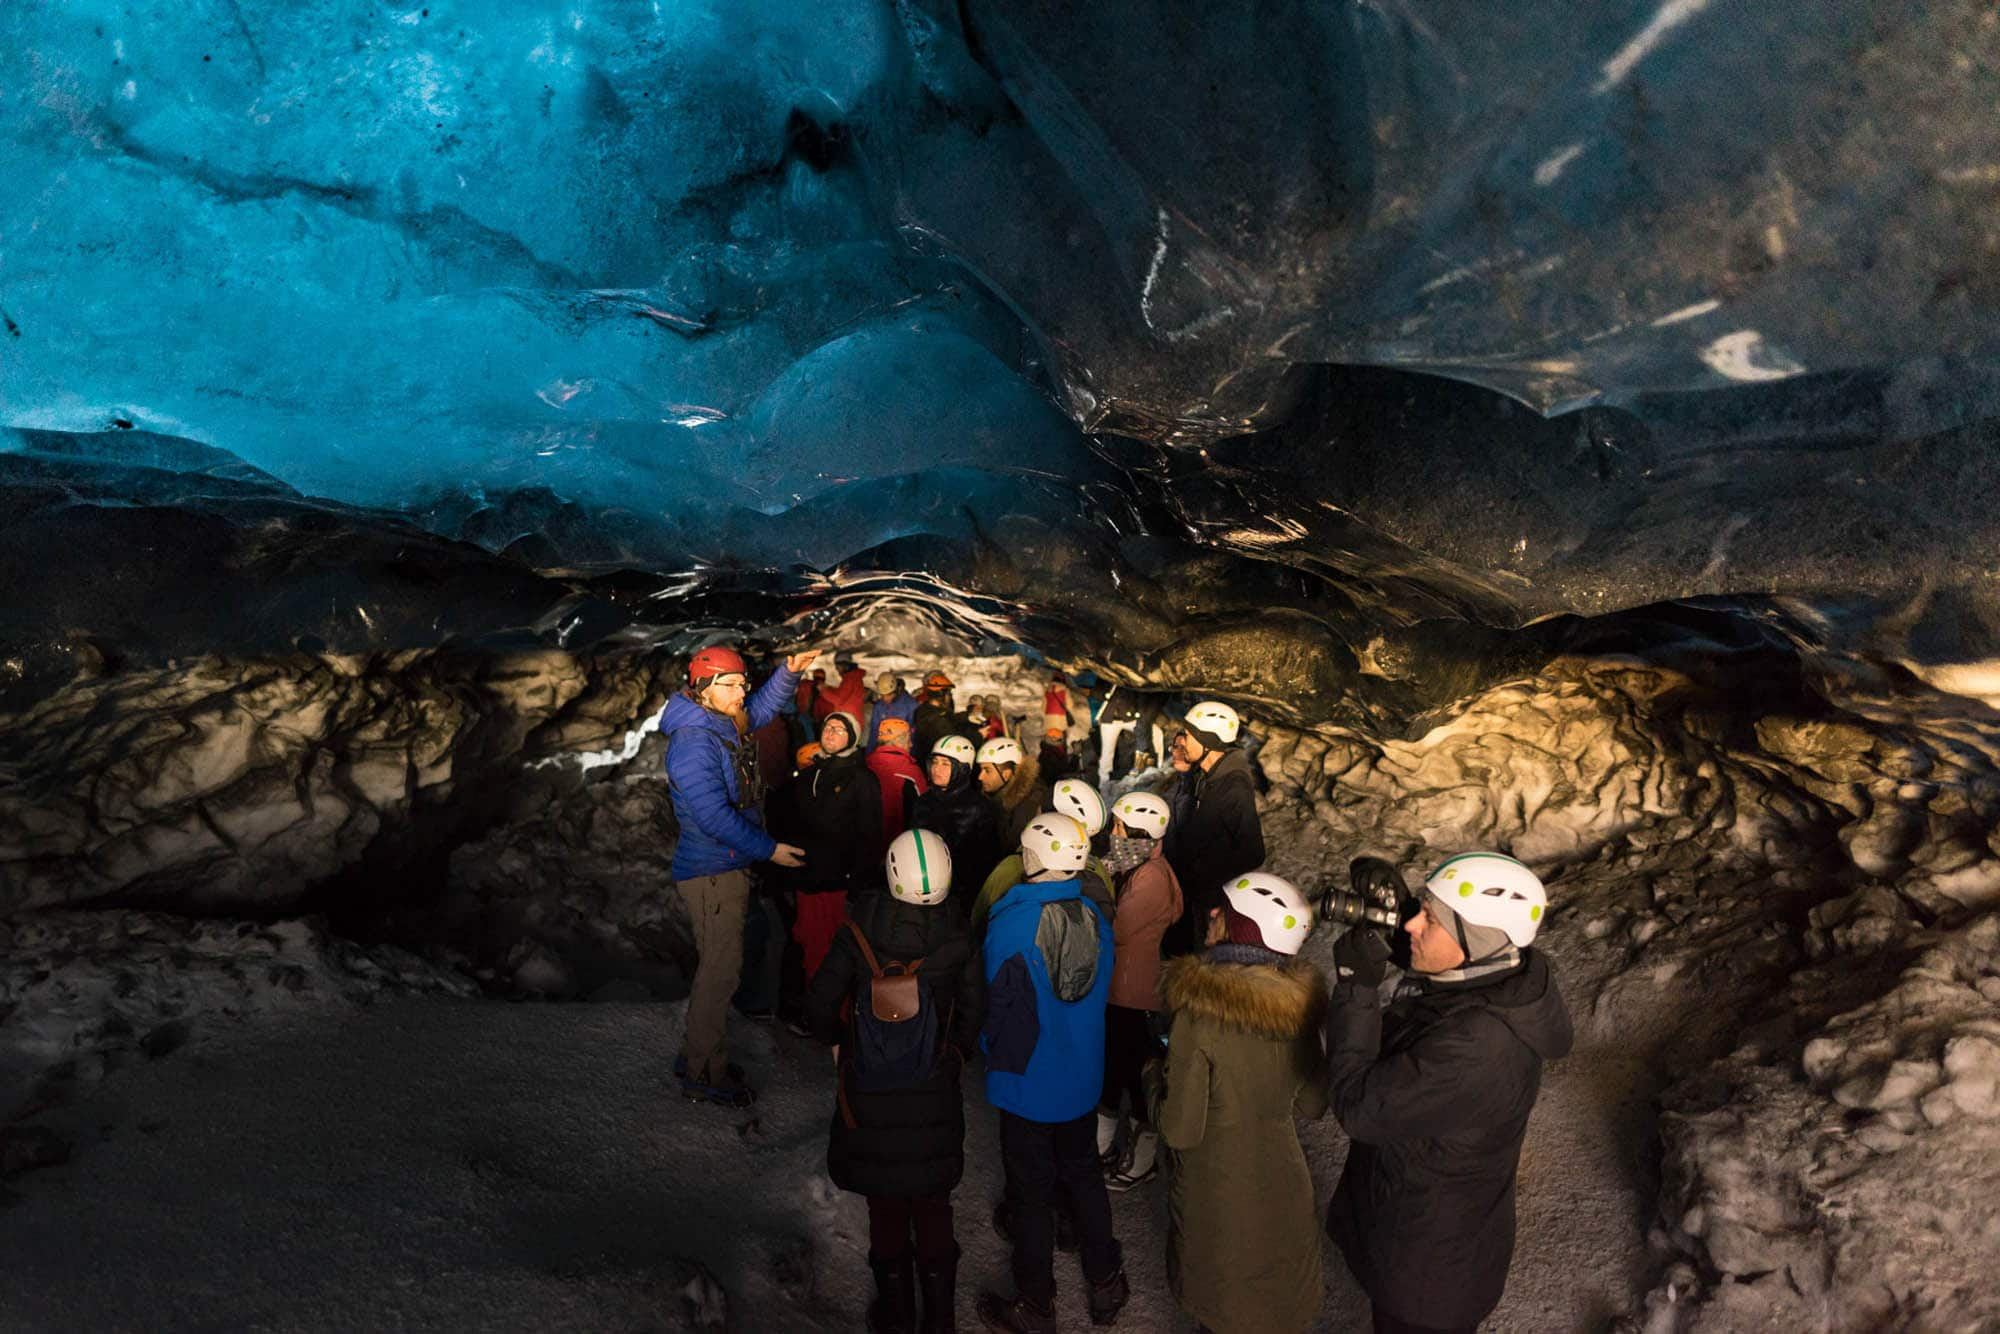 Ice Cave Tour Iceland - Vatnajokull Glacier Cave